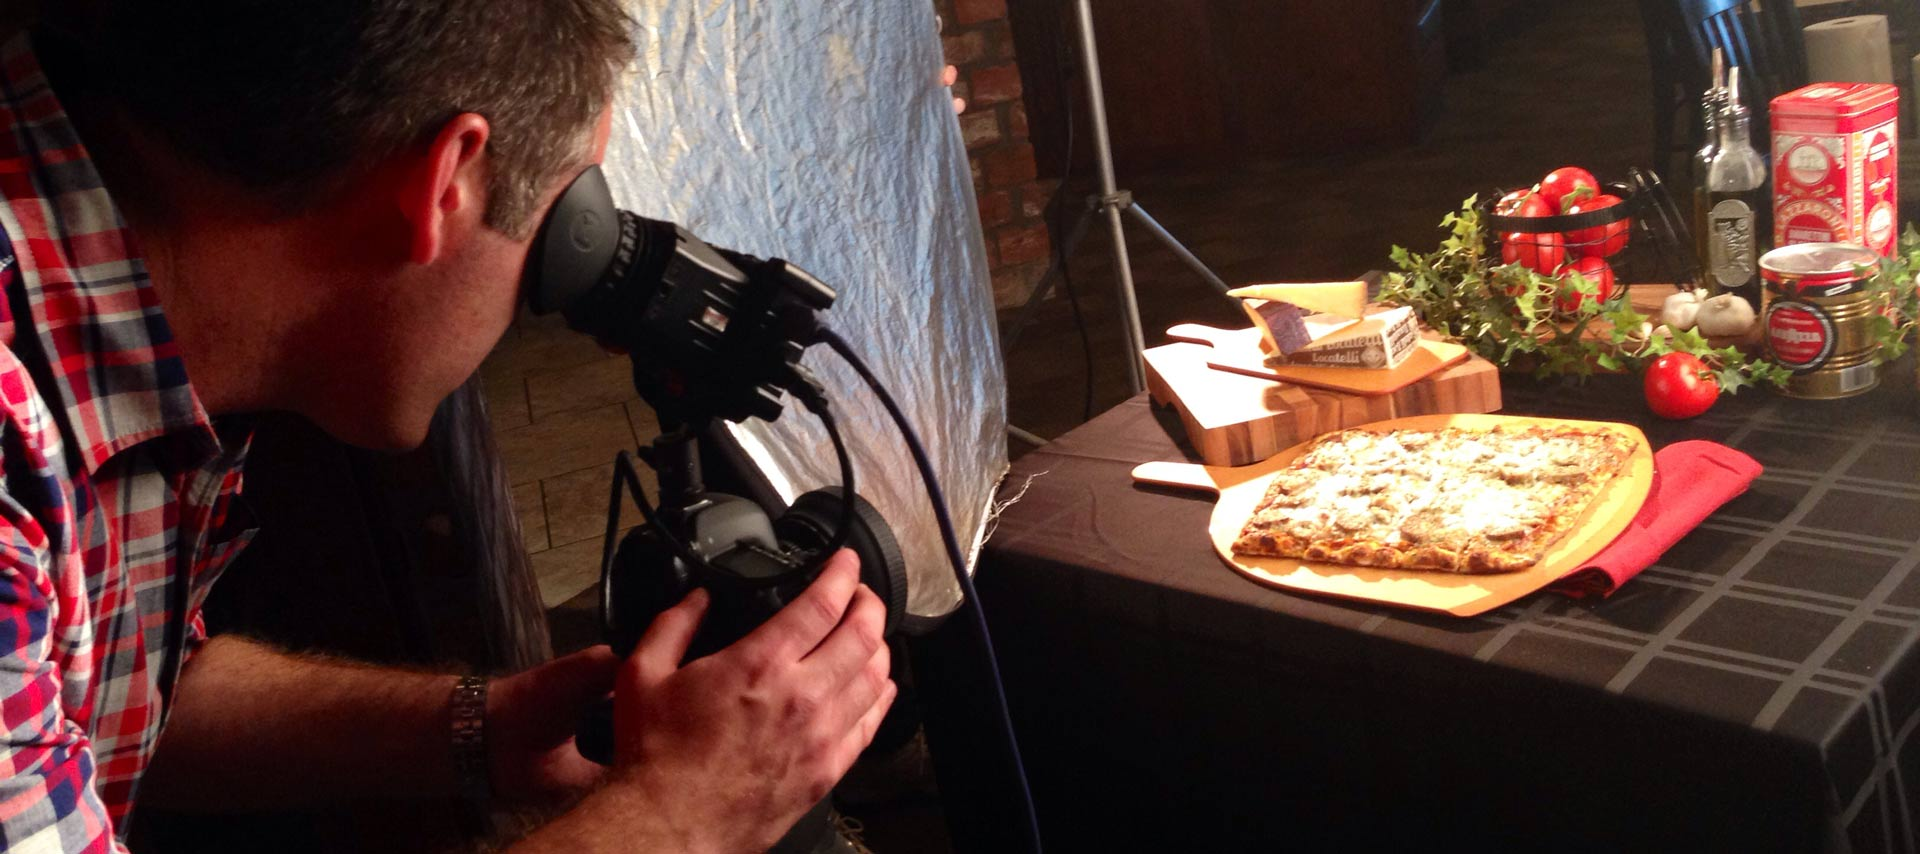 Jason DP shoots food commercial